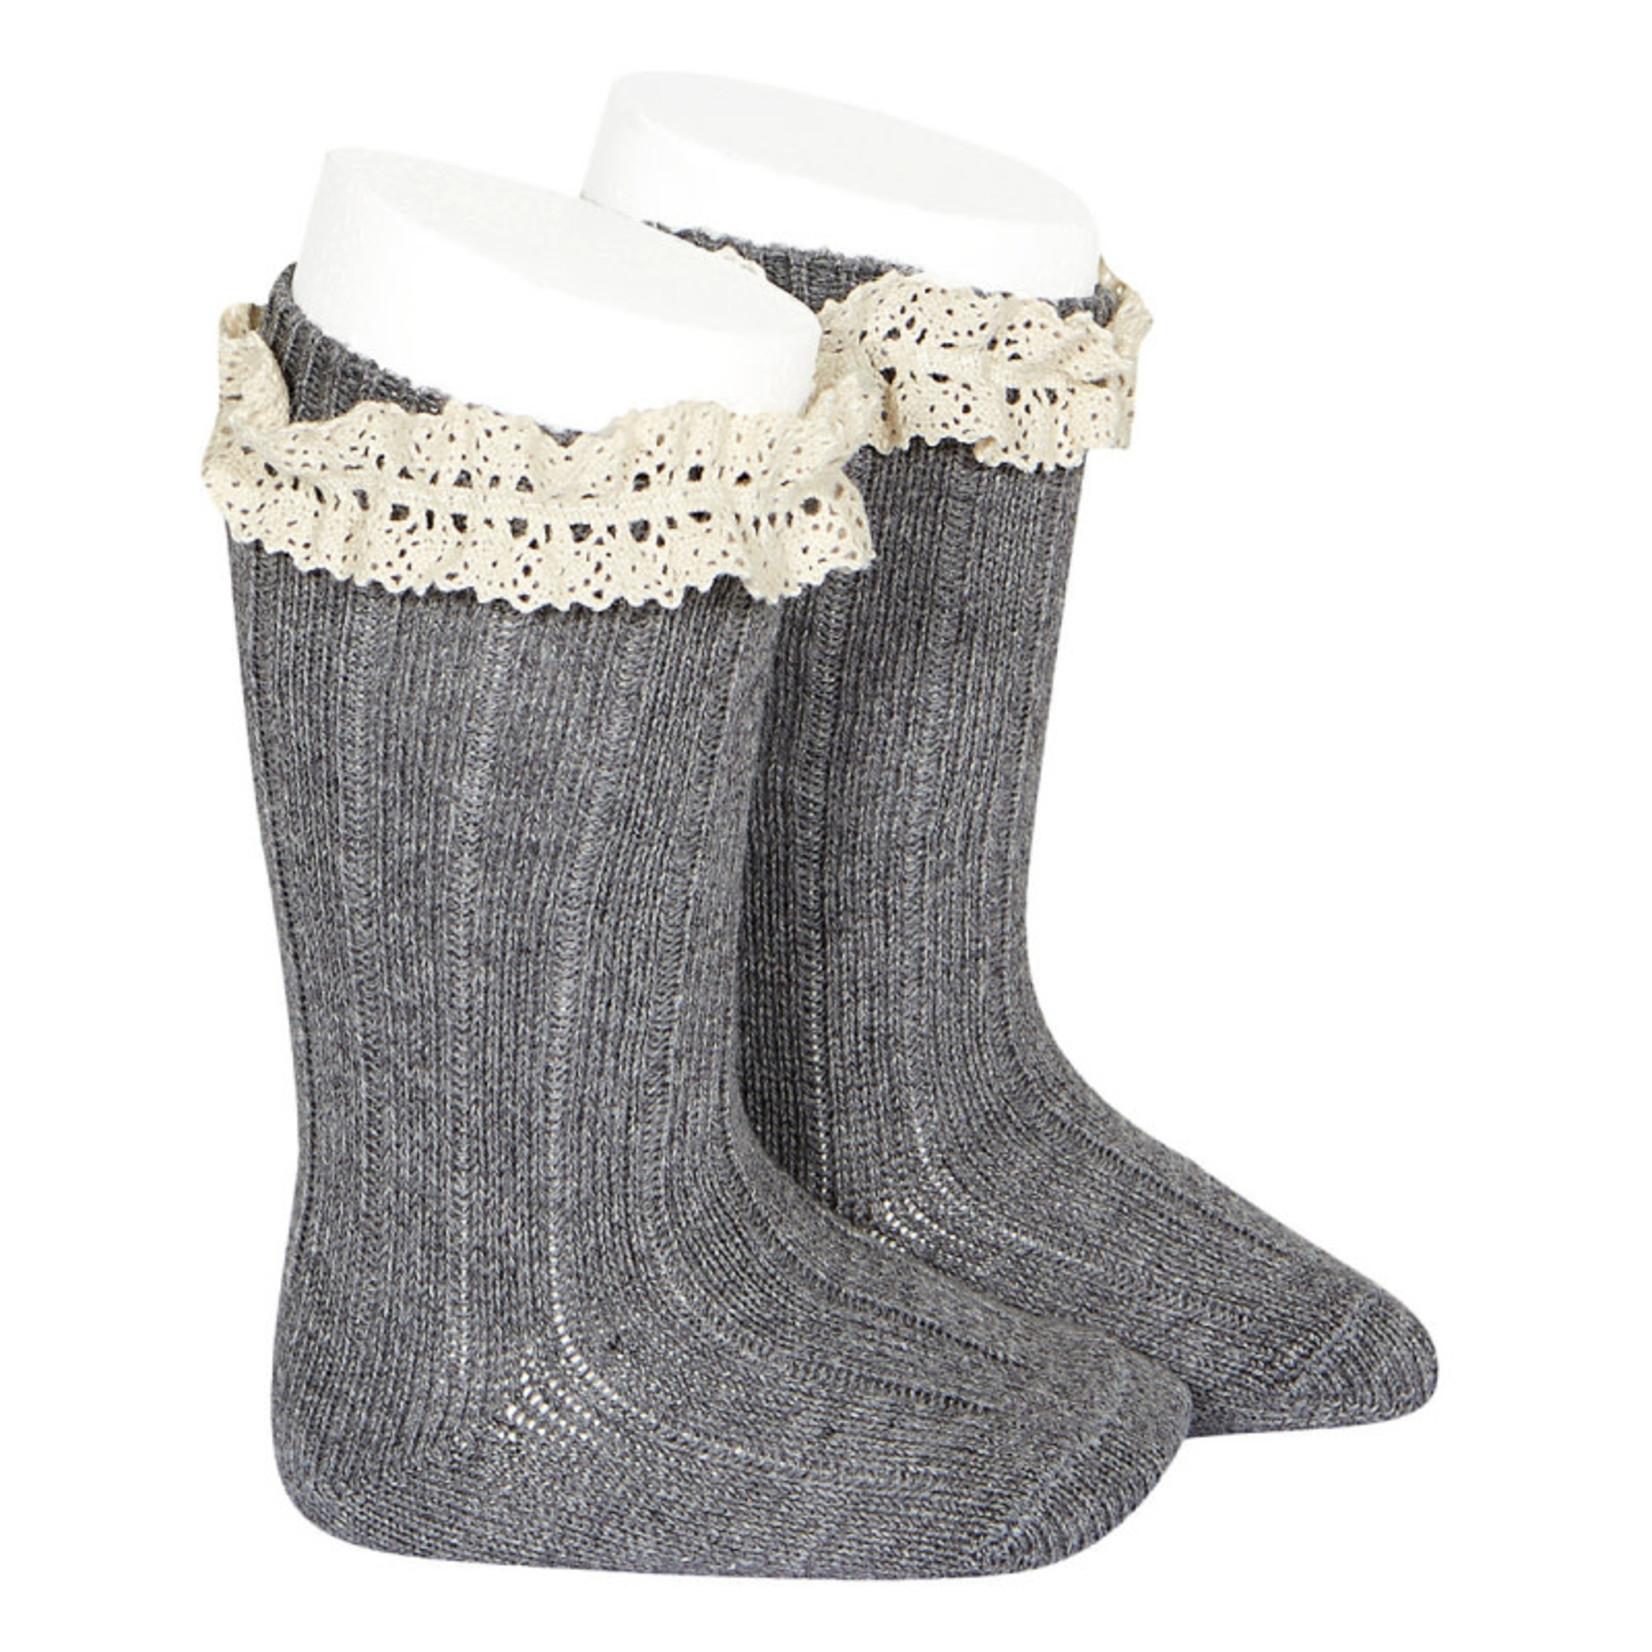 Rib Knee High Socks Vintage - Gray